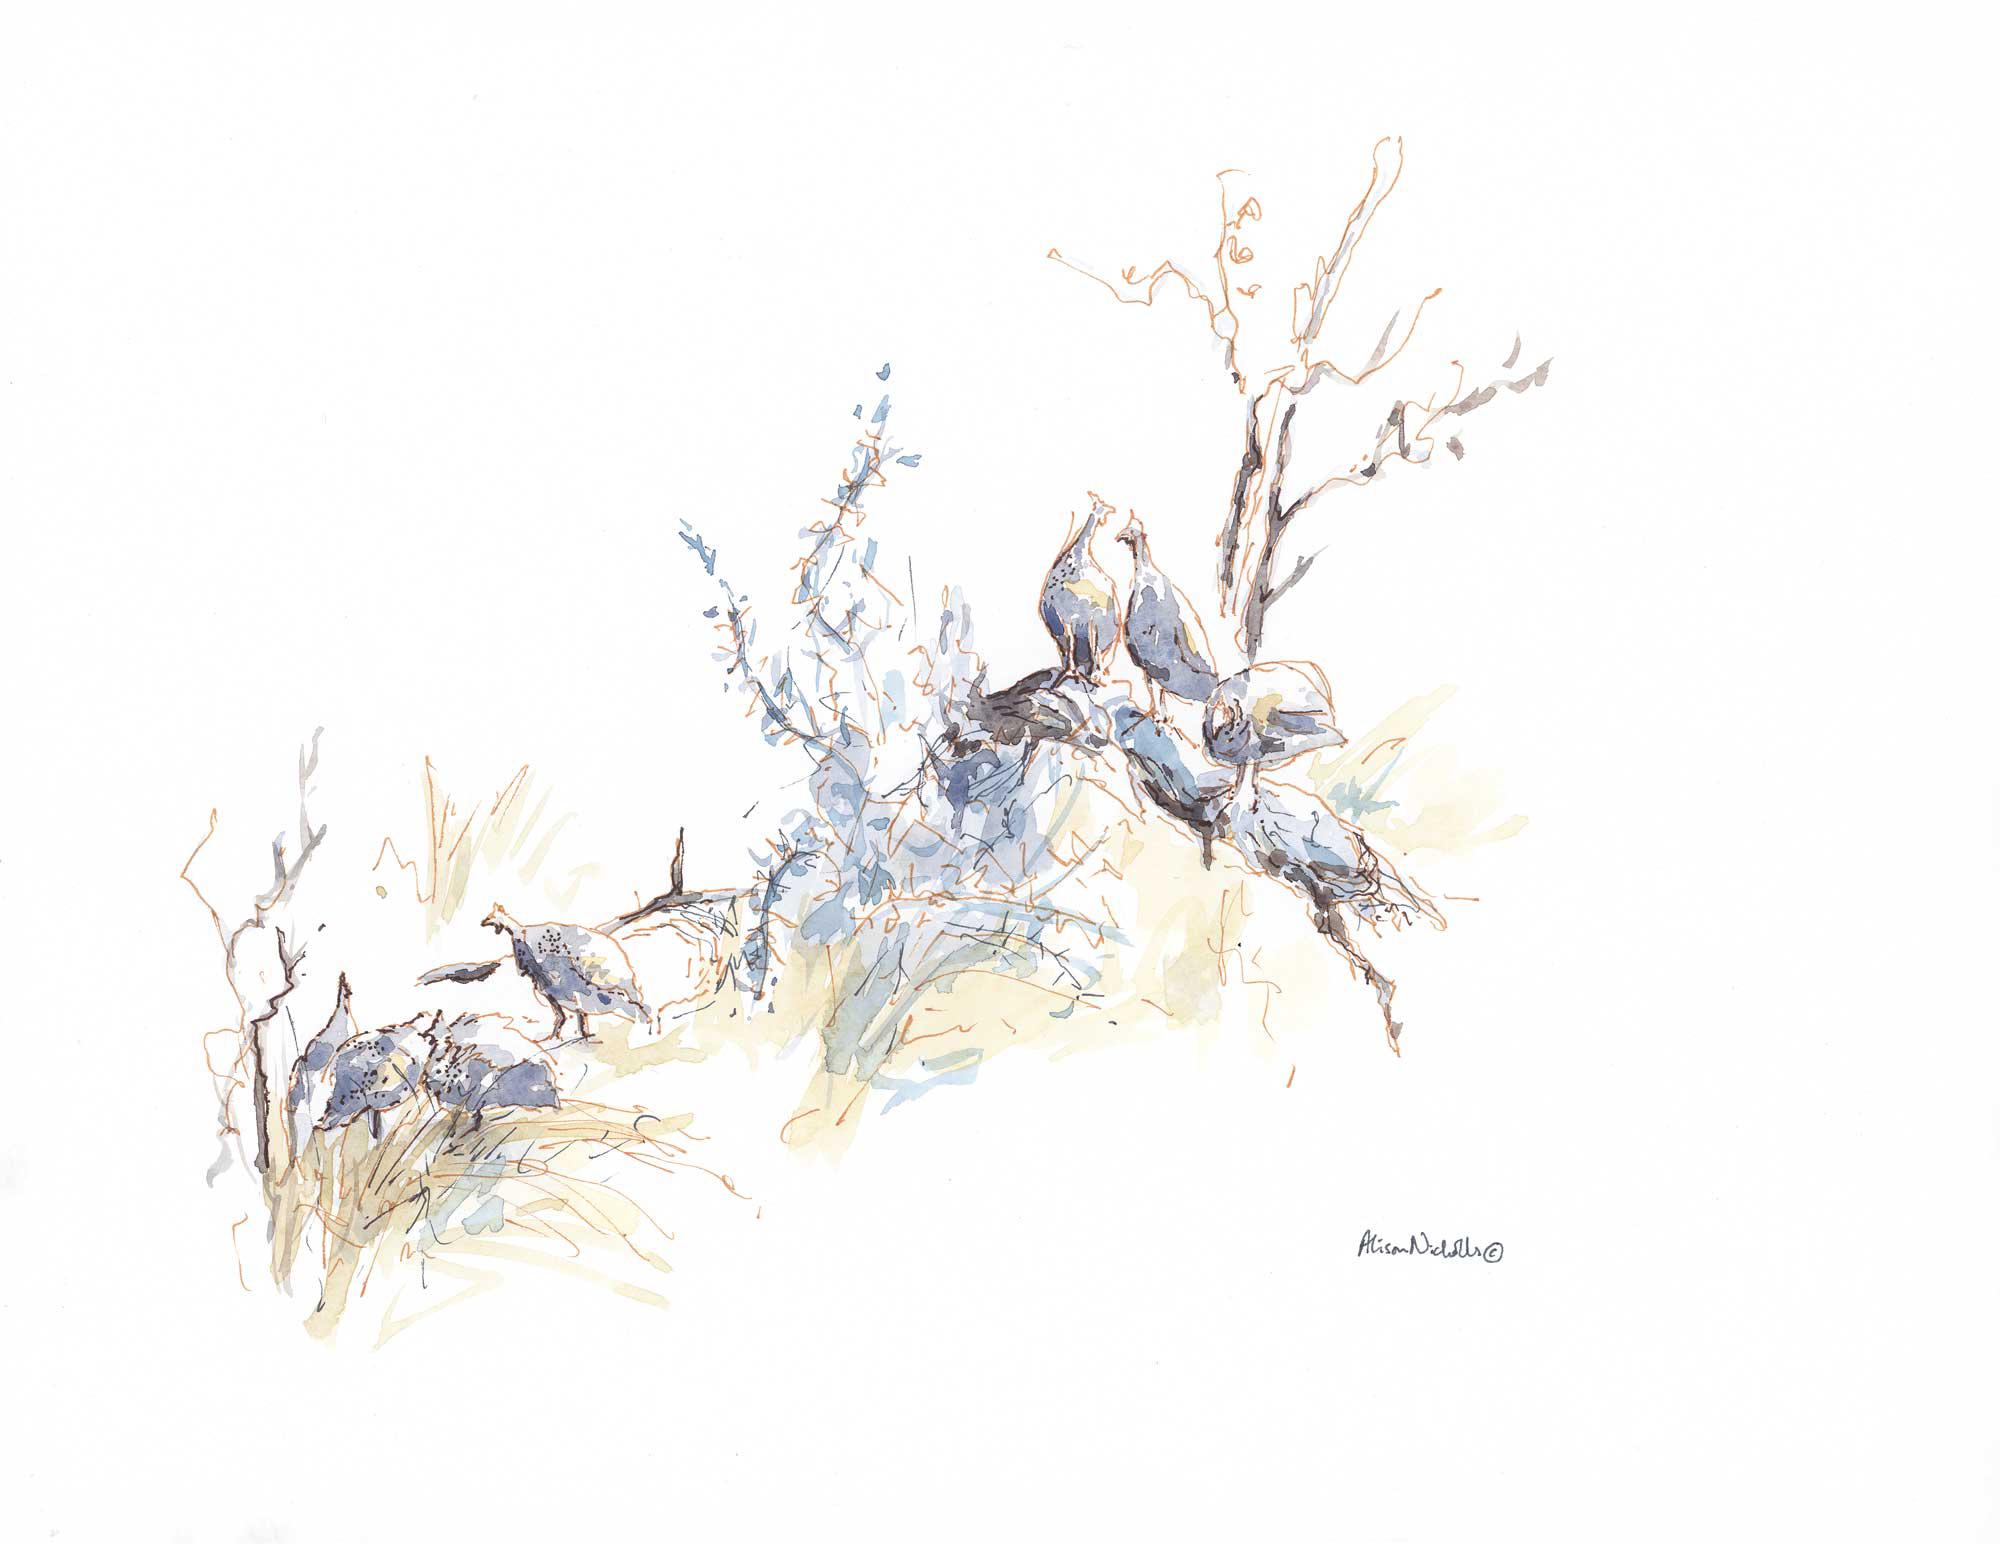 Guineafowl Flock © Alison Nicholls